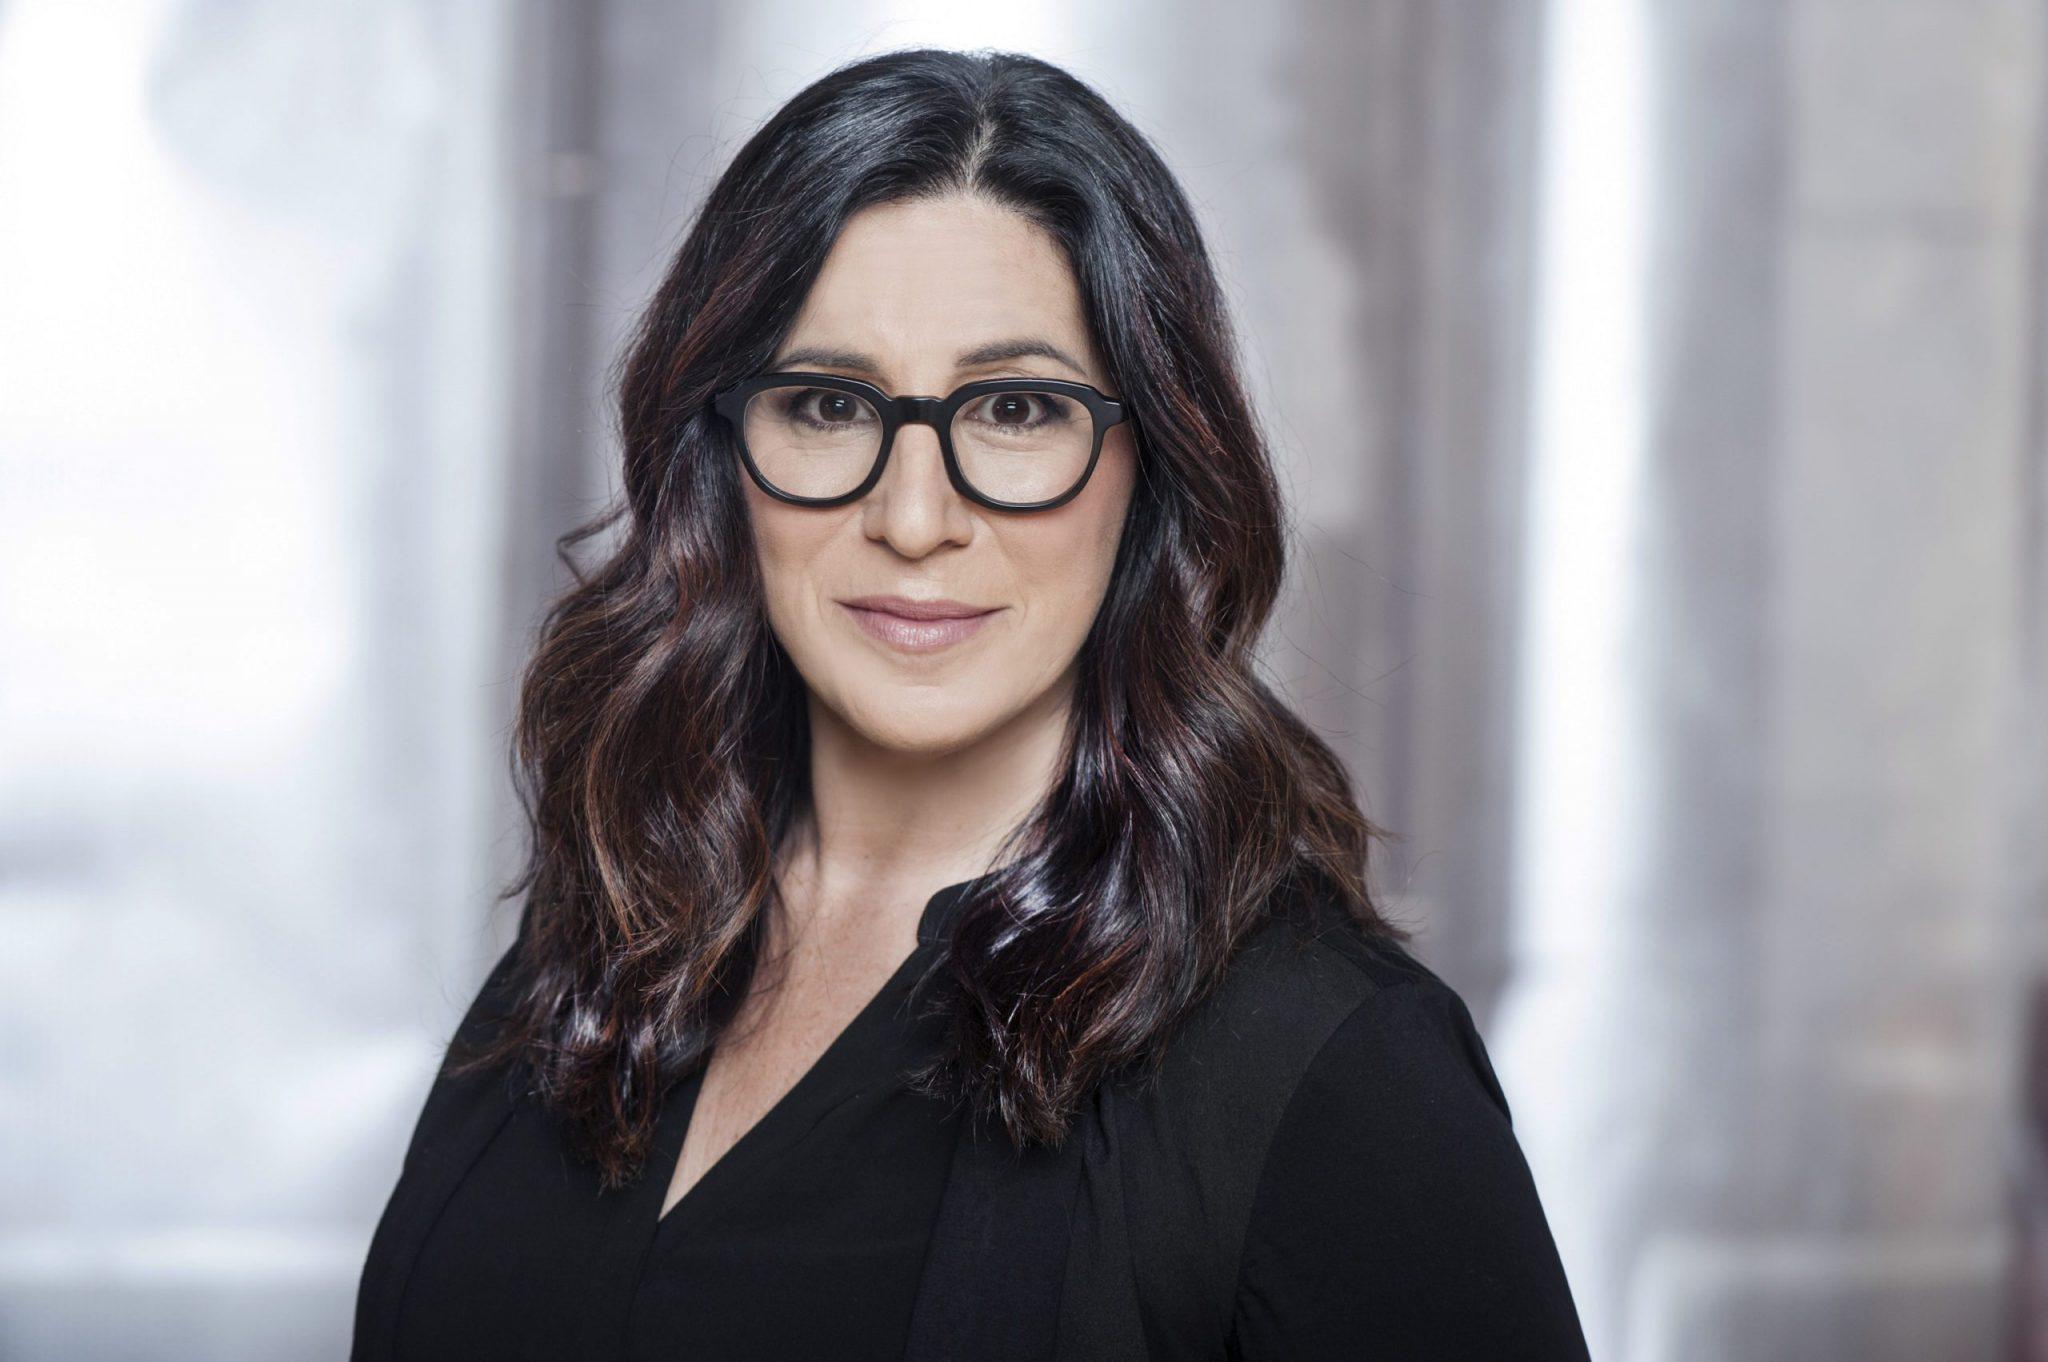 Leslie Ehm headshot glasses